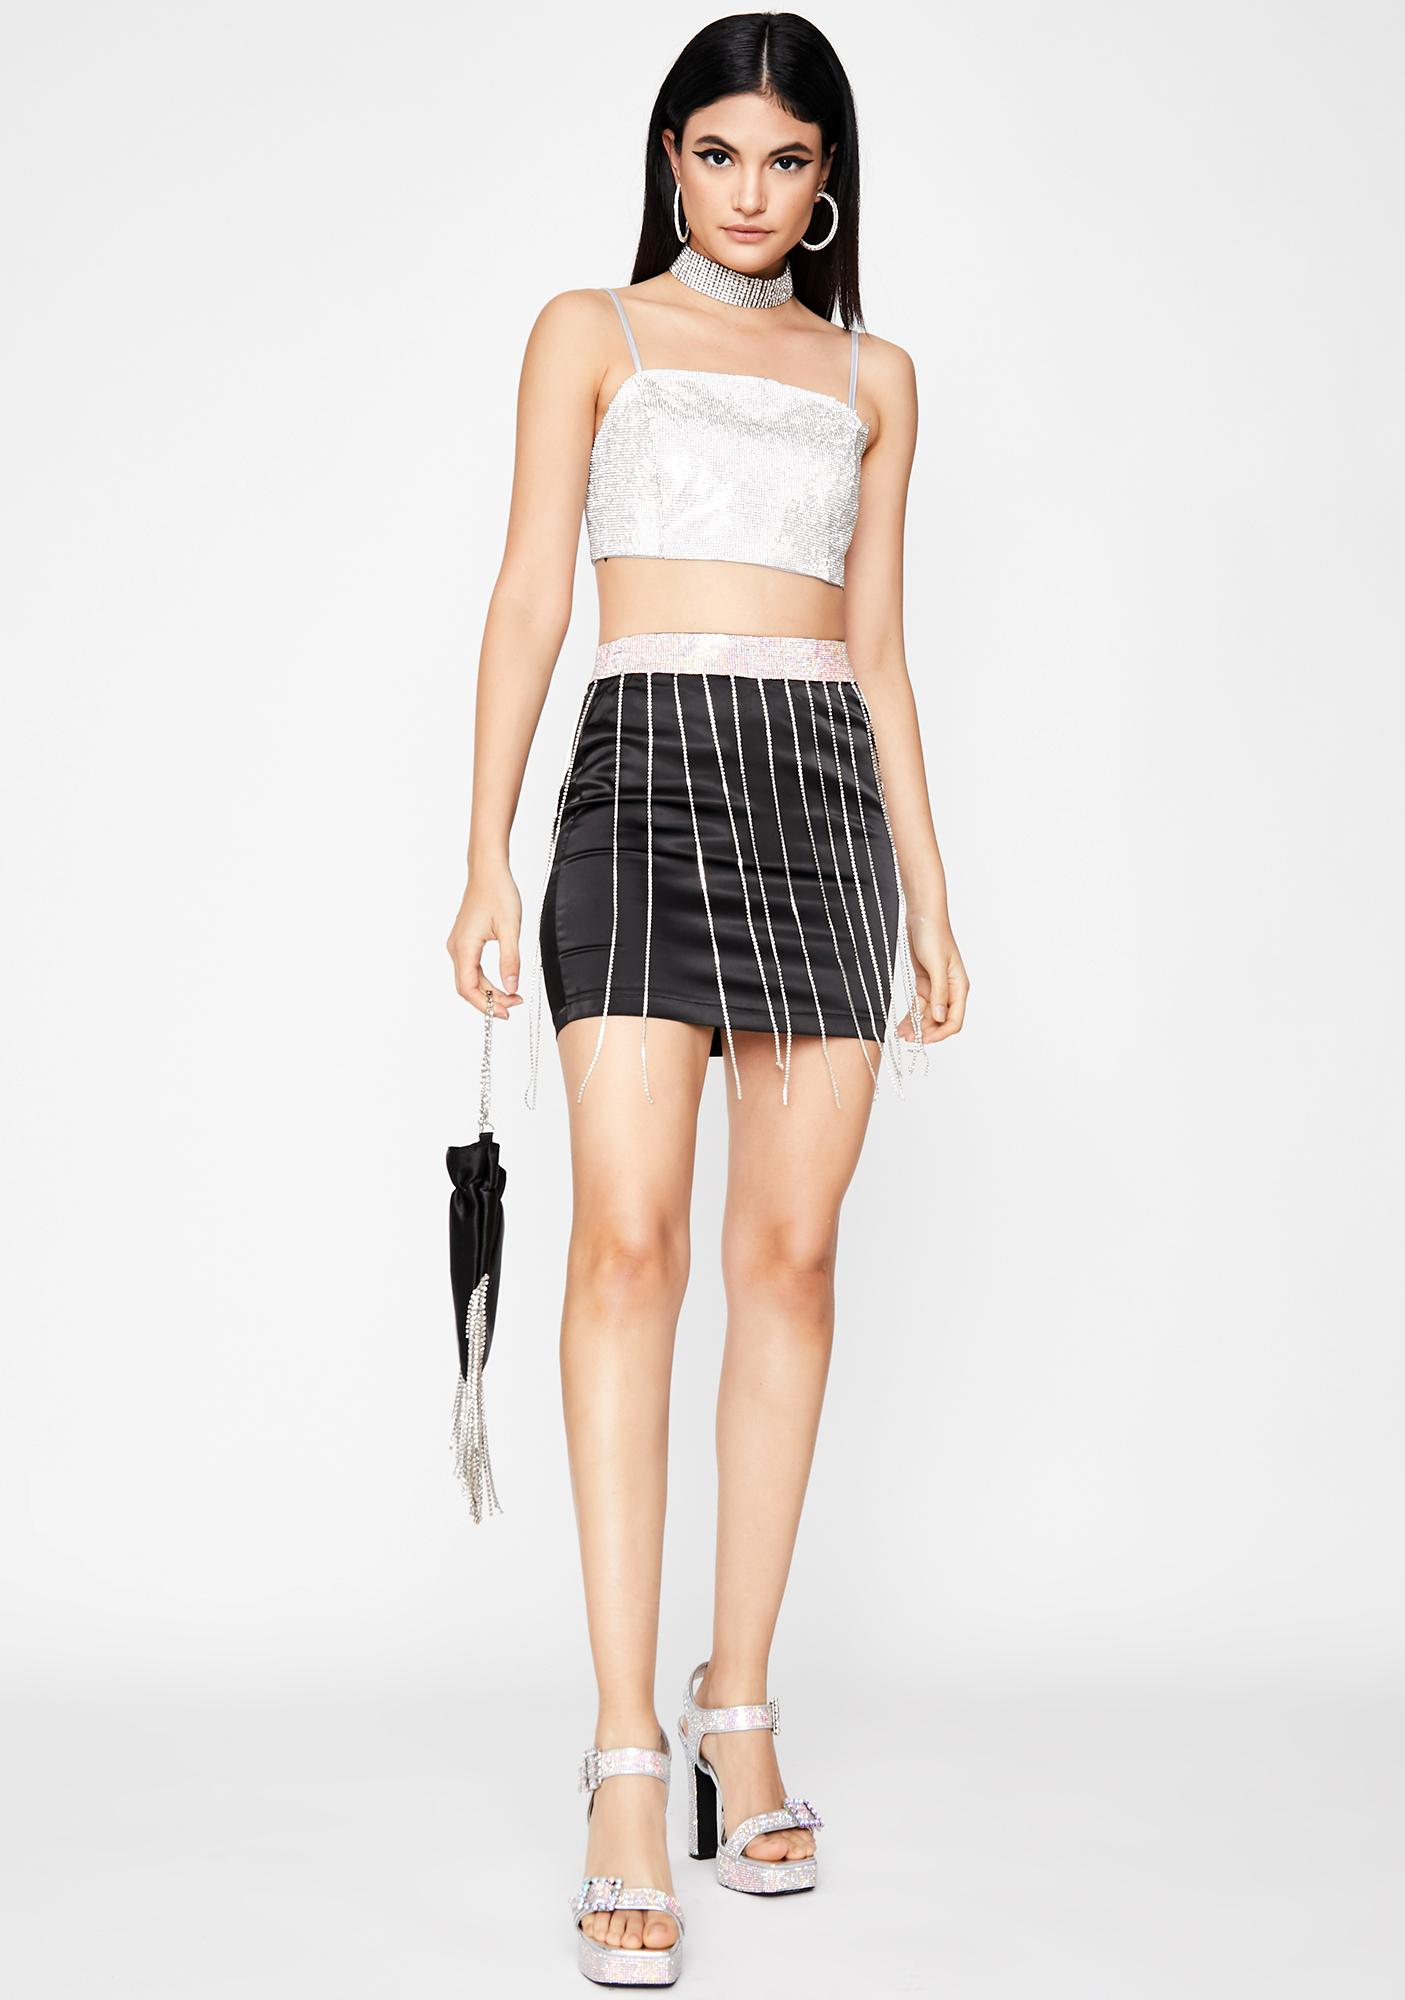 Supa Freak Rhinestone Skirt